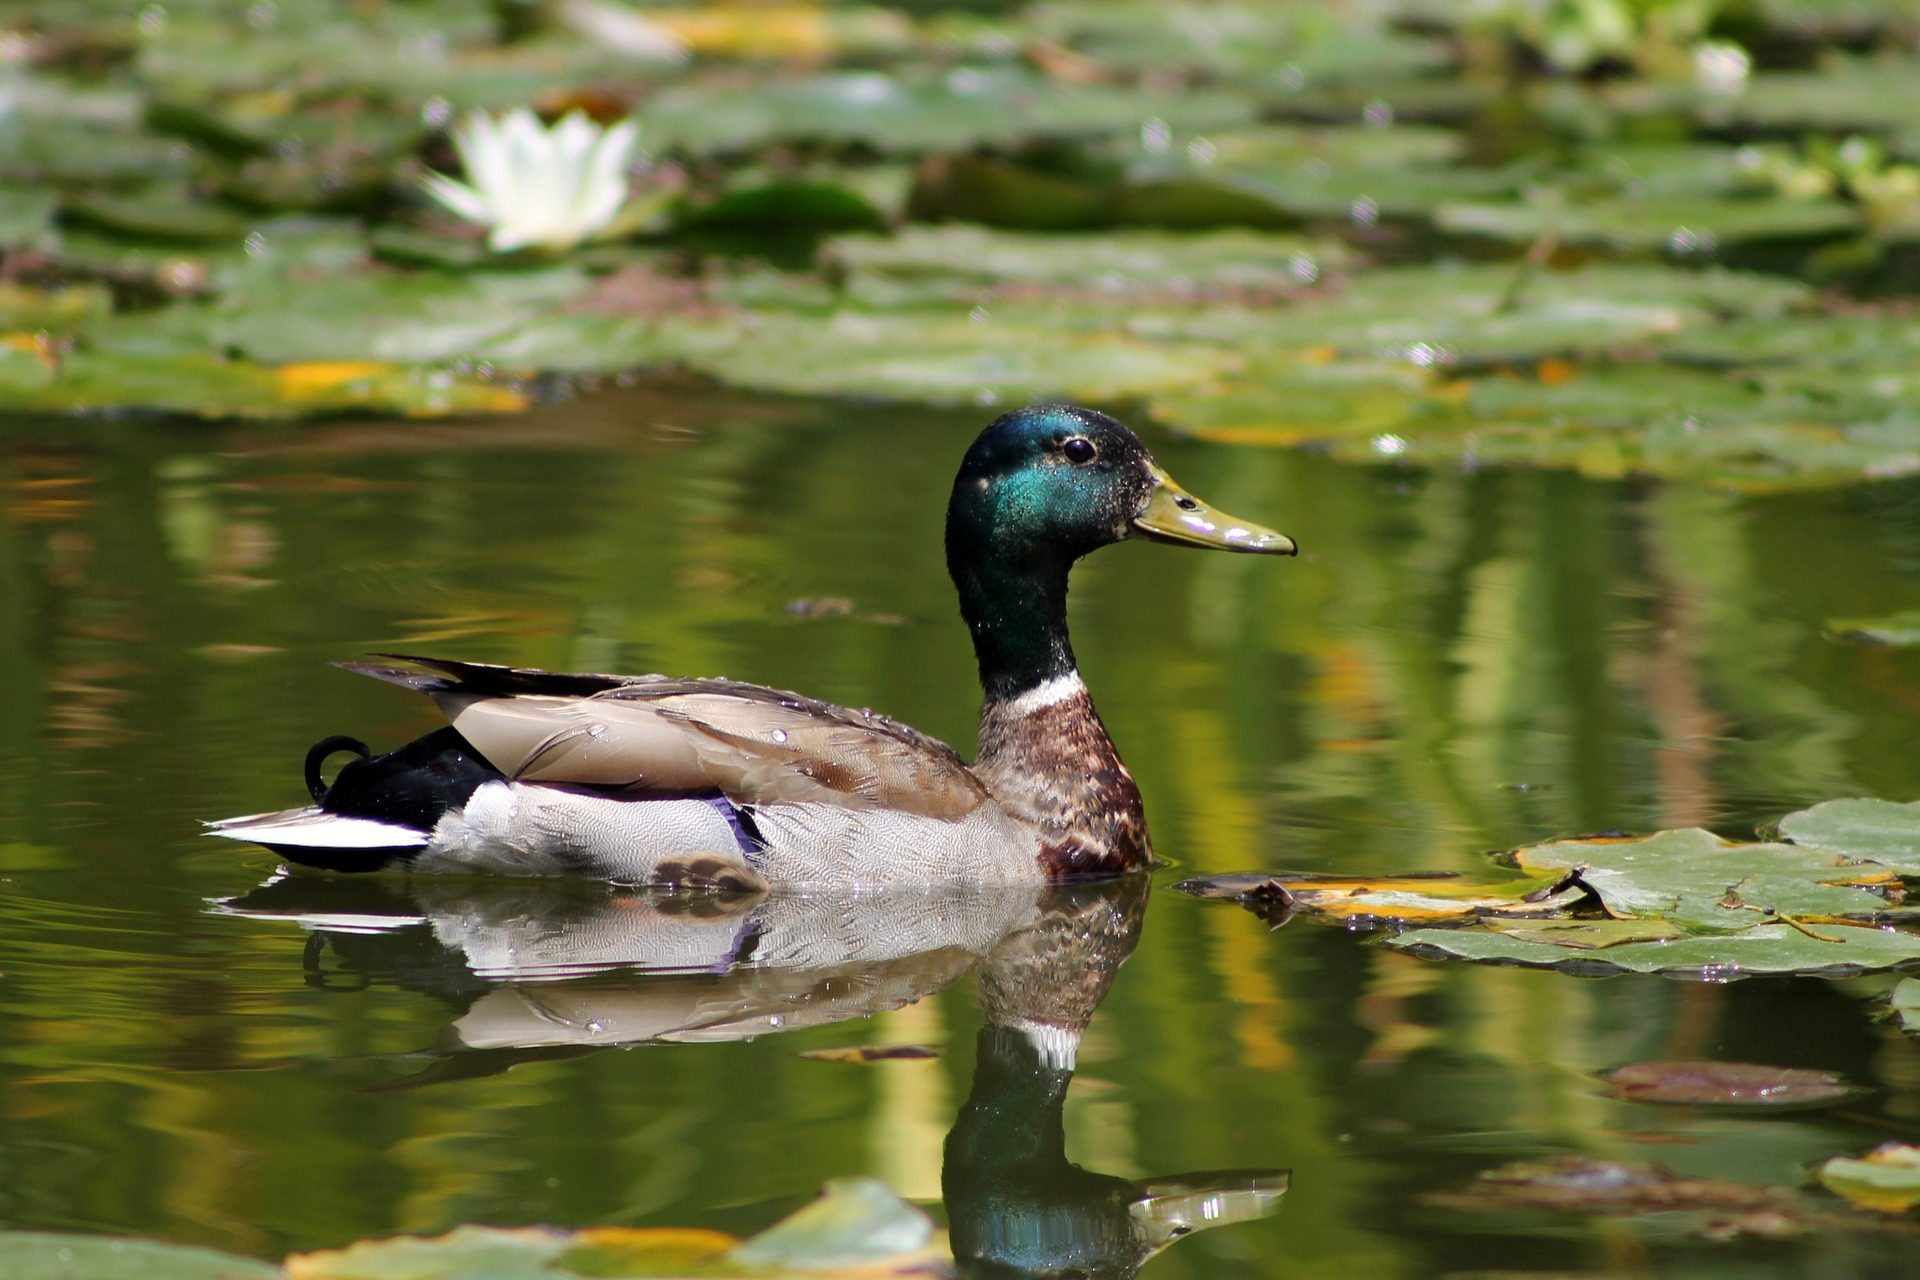 Canard, Ave, étang, Lake, feuilles, eau, lis d'eau - Fonds d'écran HD - Professor-falken.com